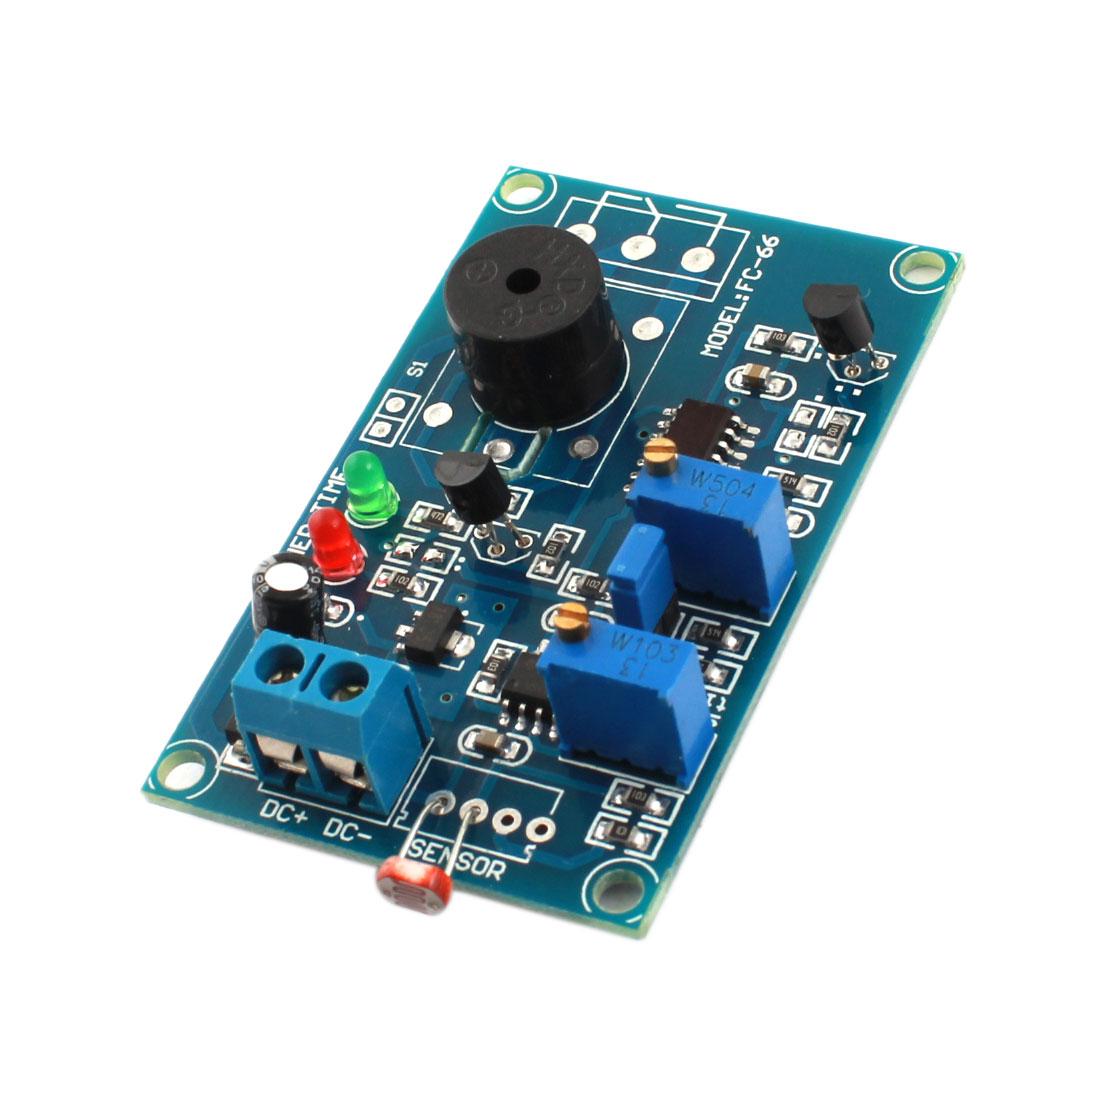 FC-66 DC12V 20S NO Light Trigged Photoresistor Sensor Time Delay Alarm PCB Module